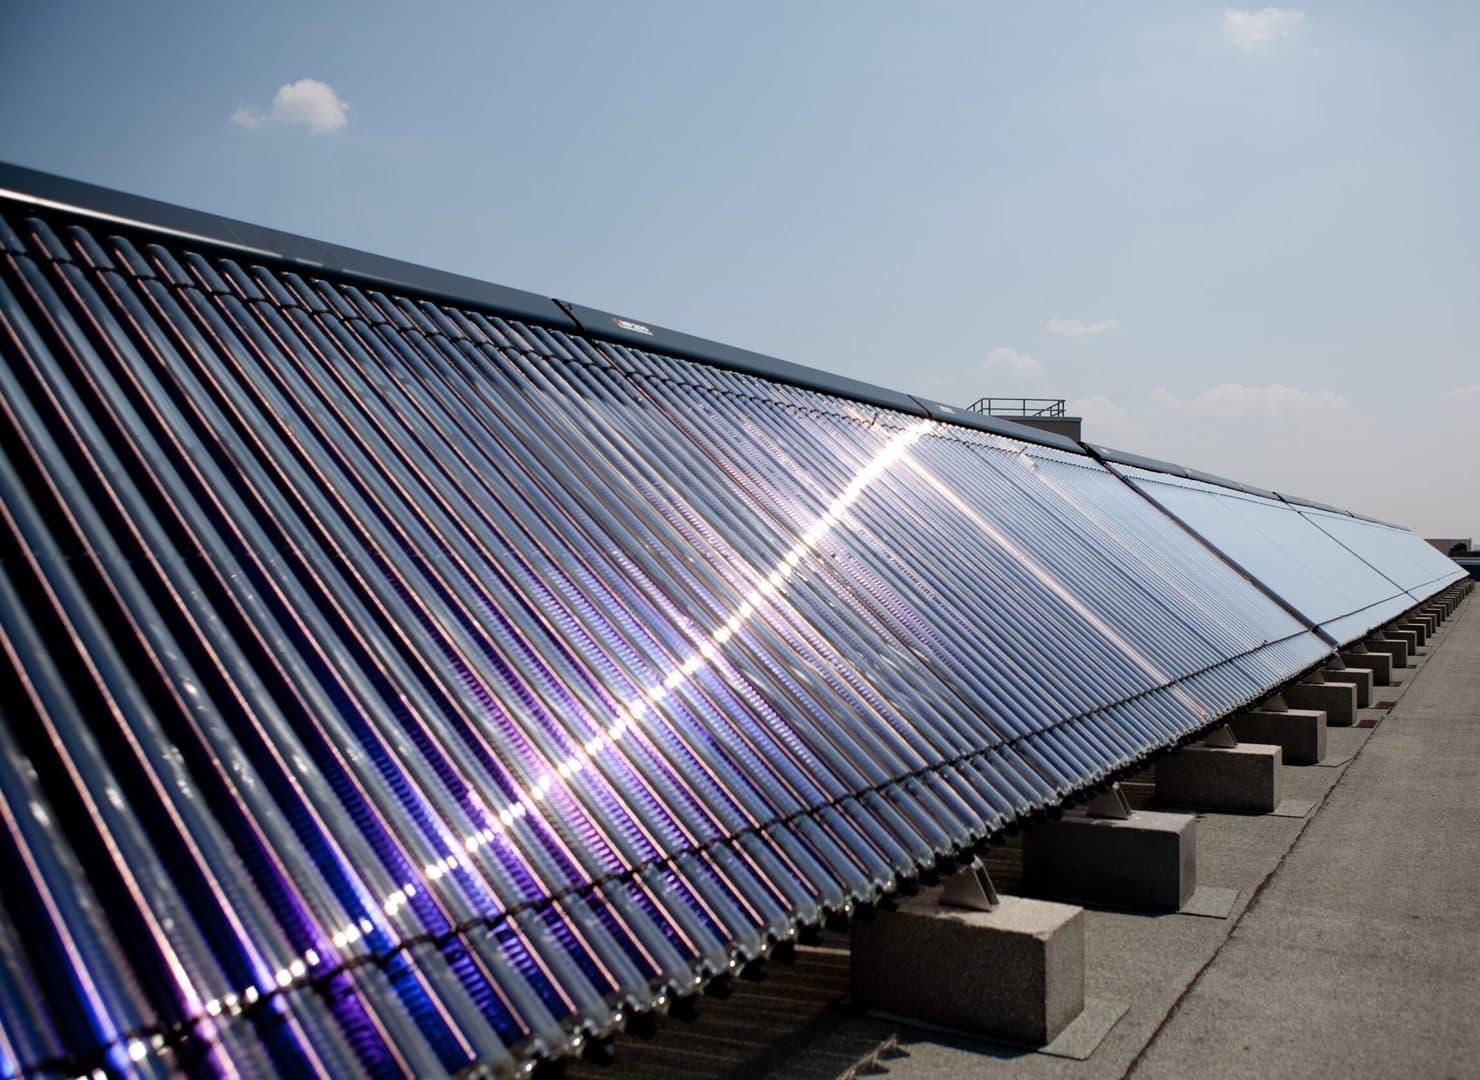 Studietur Lissabon Solar